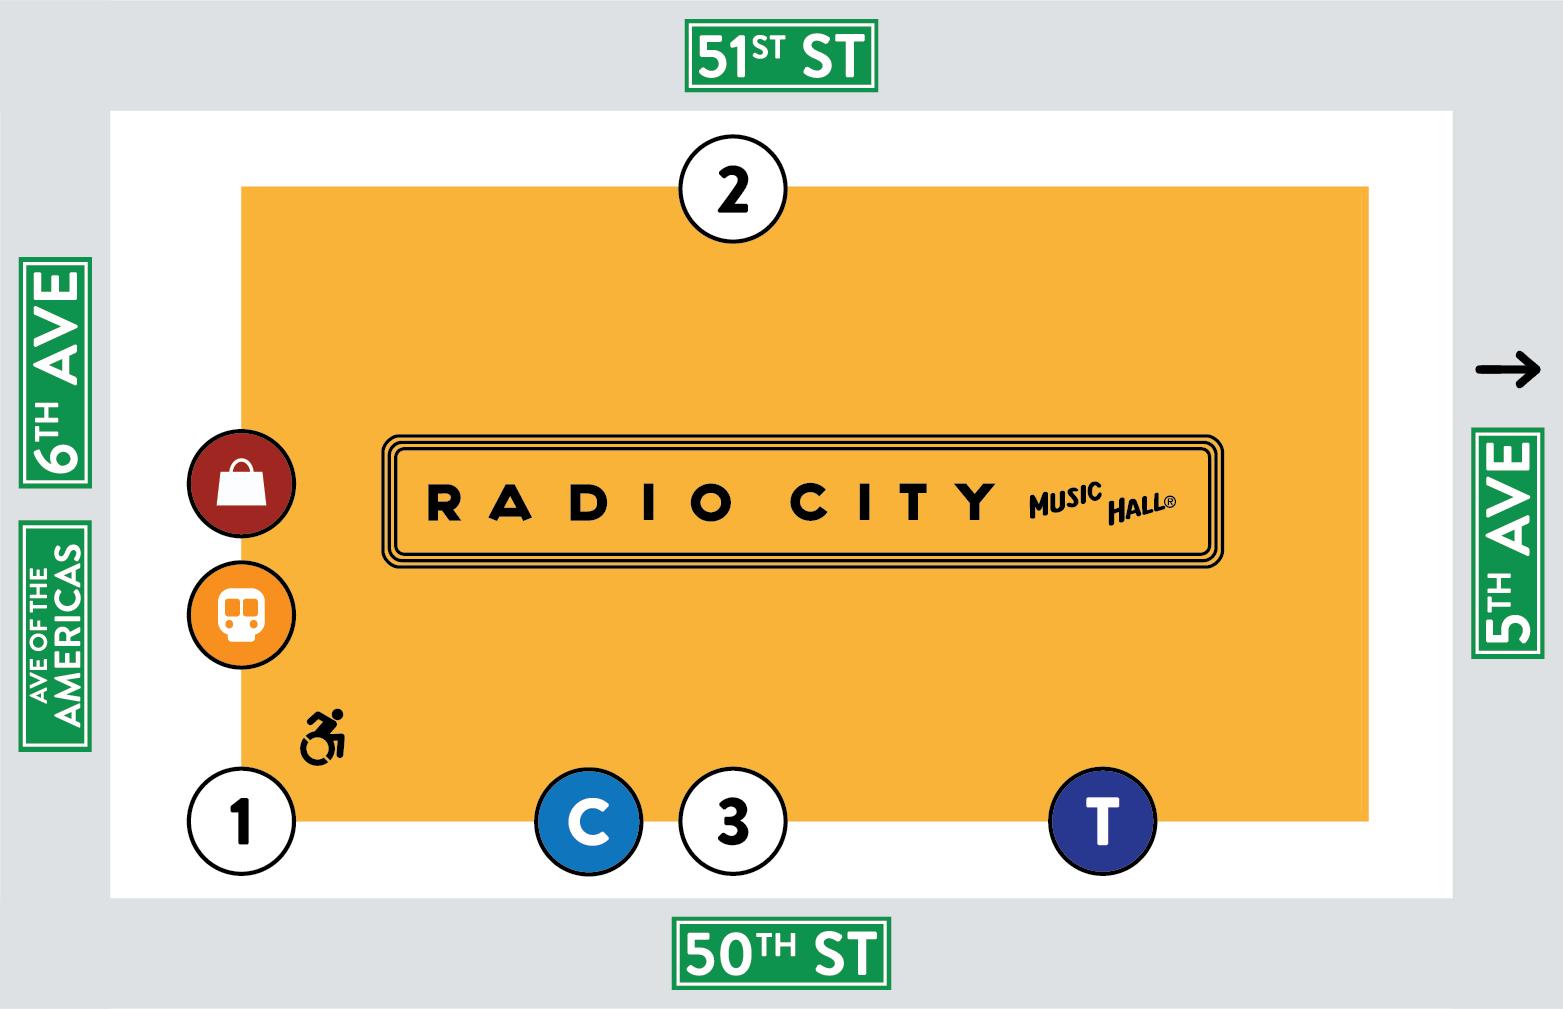 Radio City Music Hall Entrance Map